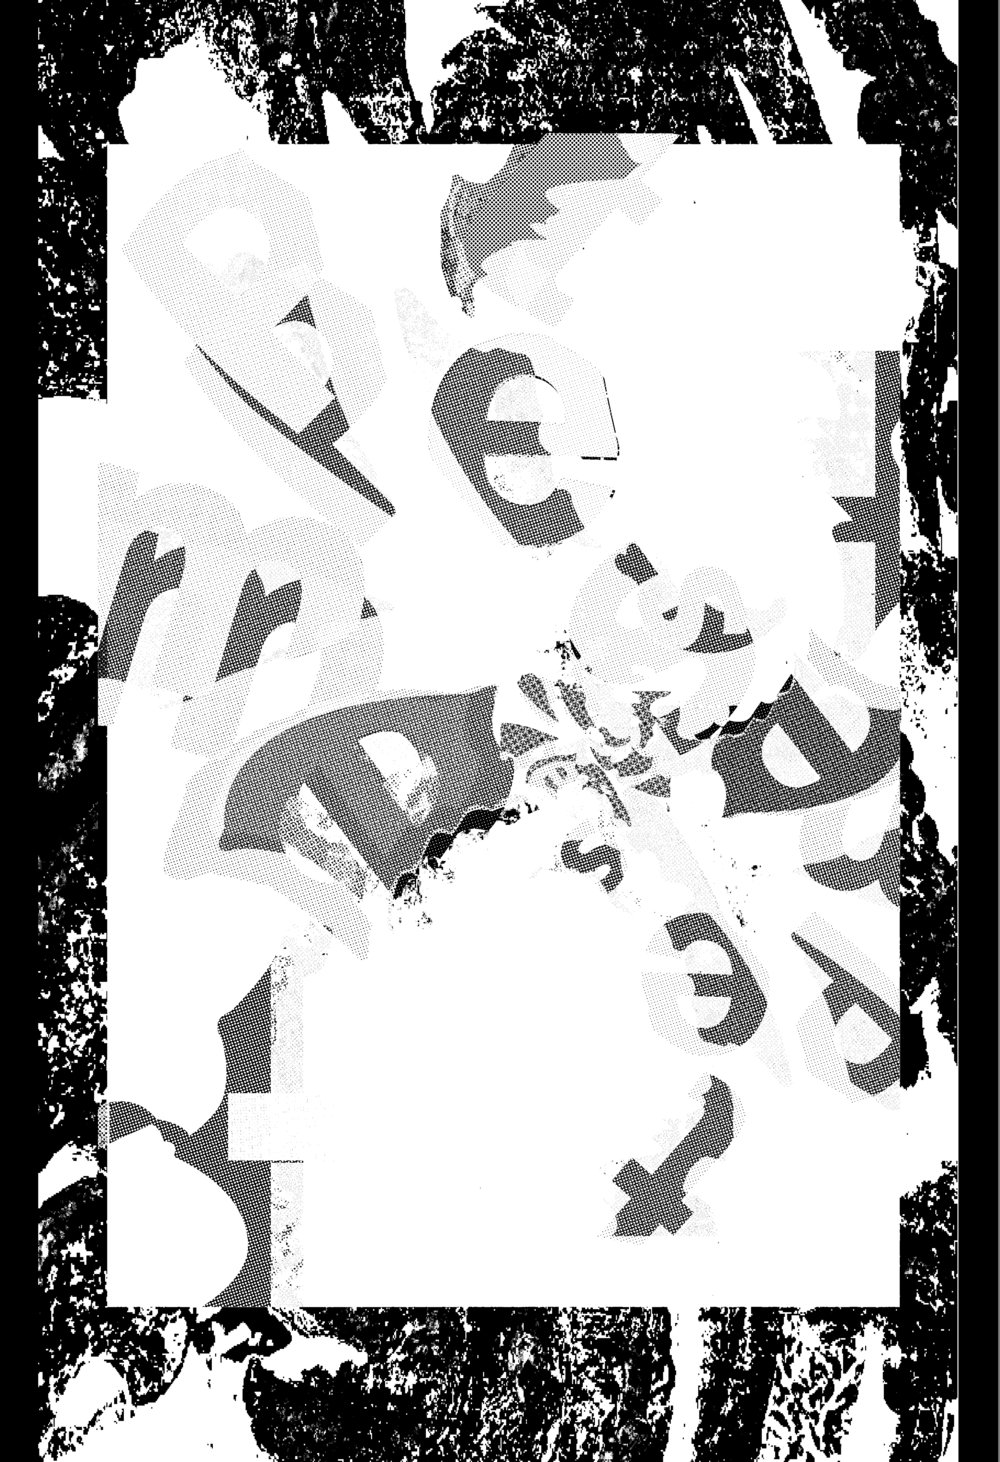 Tempest 1-01 copy.jpg